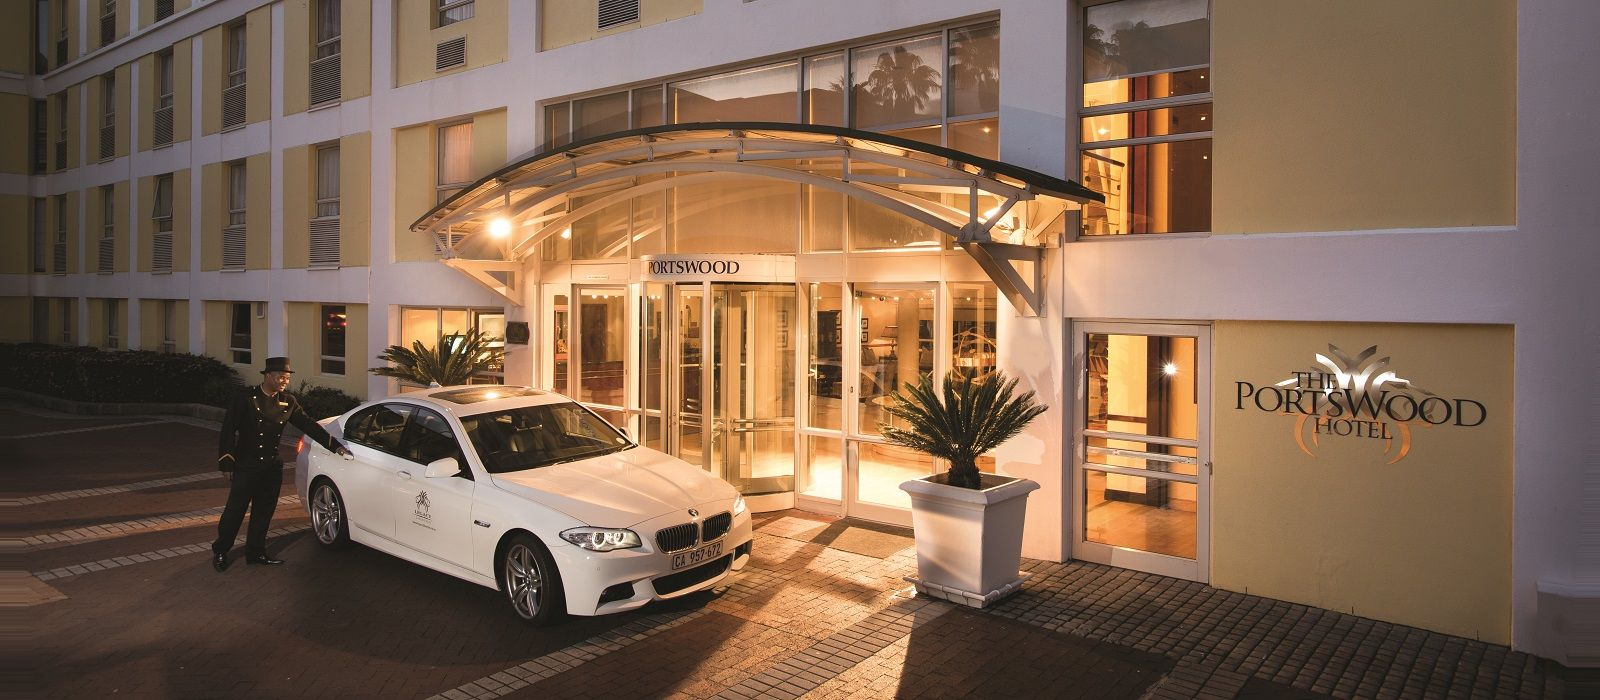 Hotel Portswood  South Africa